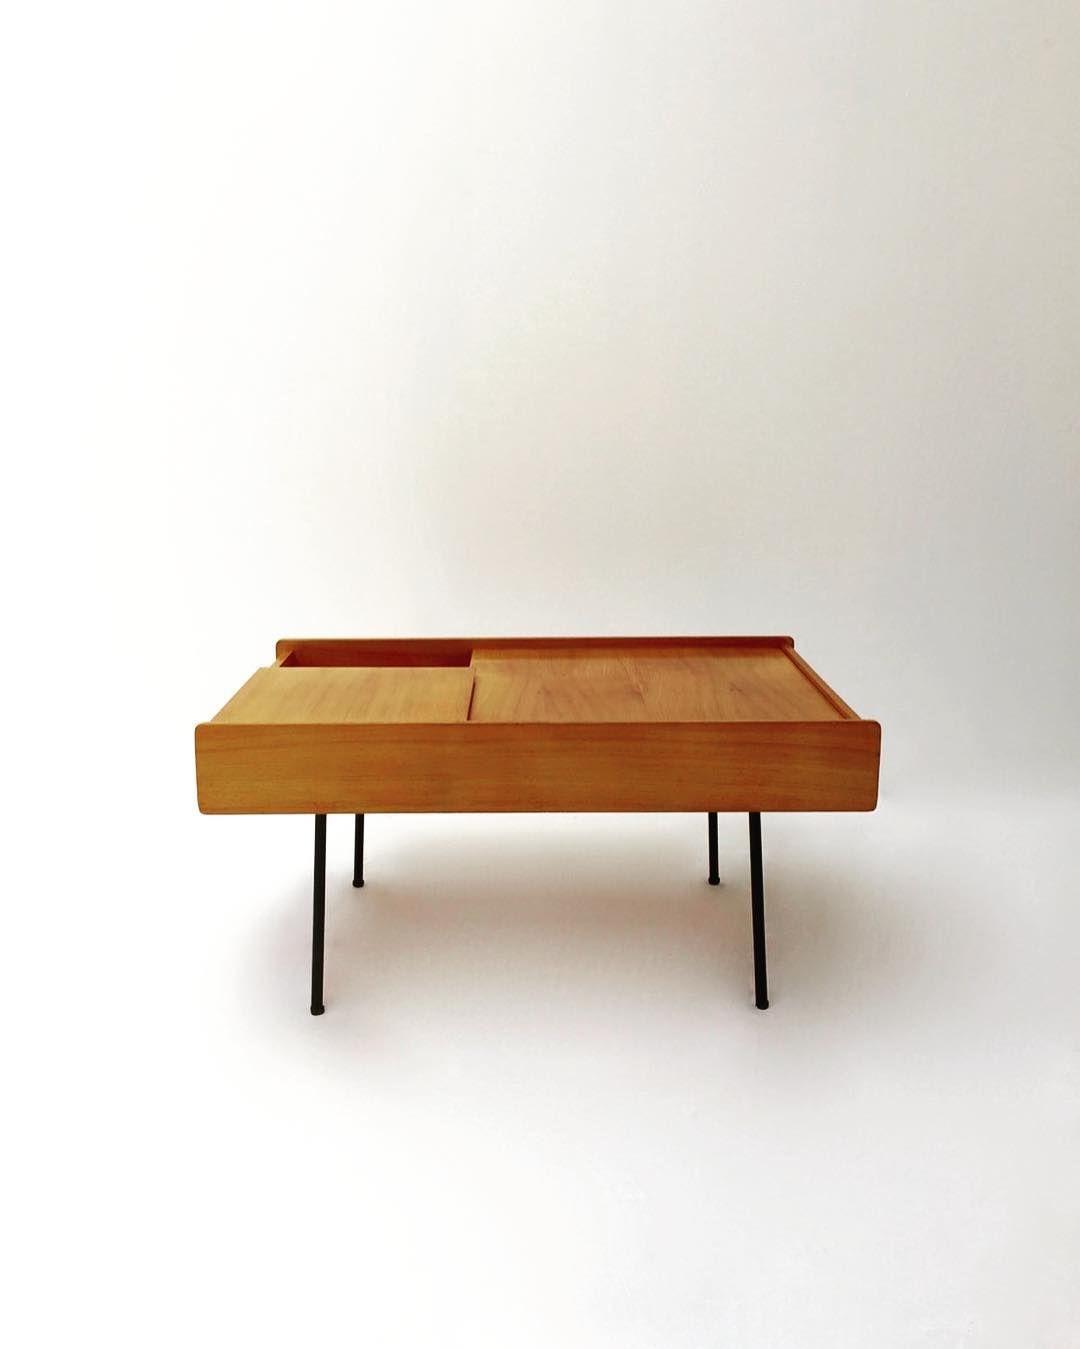 Pierre Paulin 119 Meubles Tv France 1953 Low Tables Table Home Decor